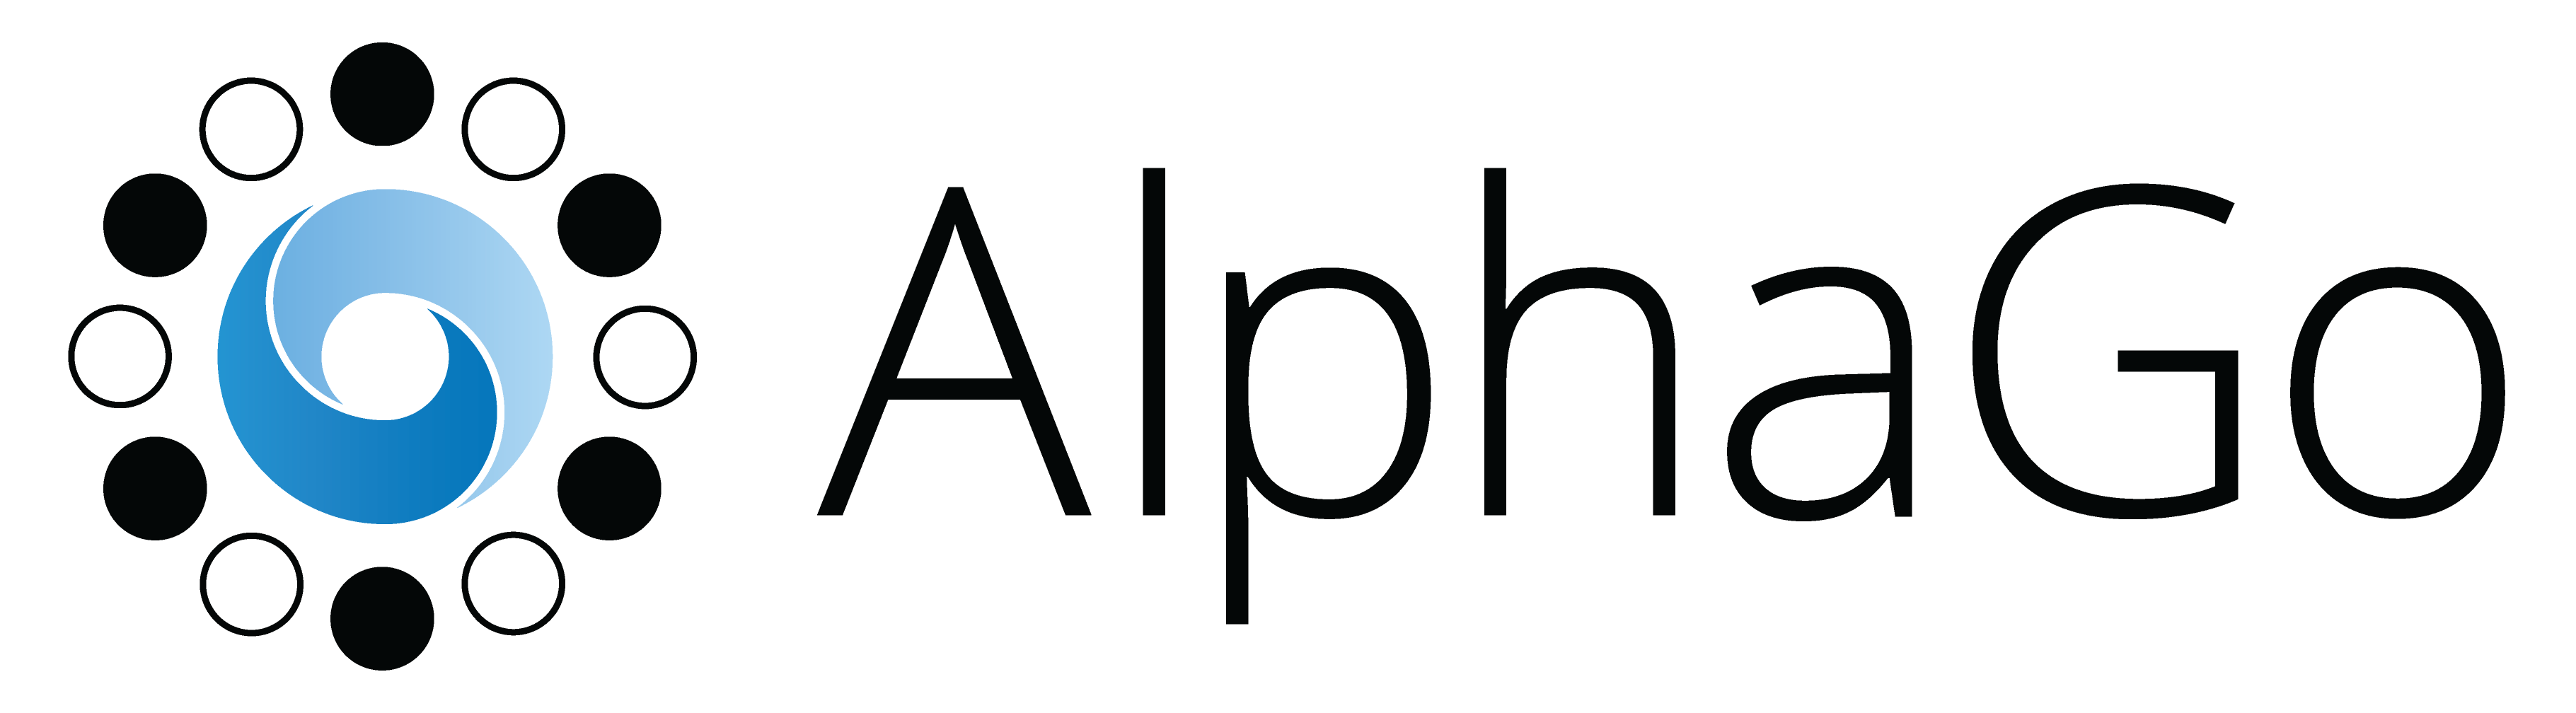 AlphaGo-Logotype-Black-Highres-300ppi